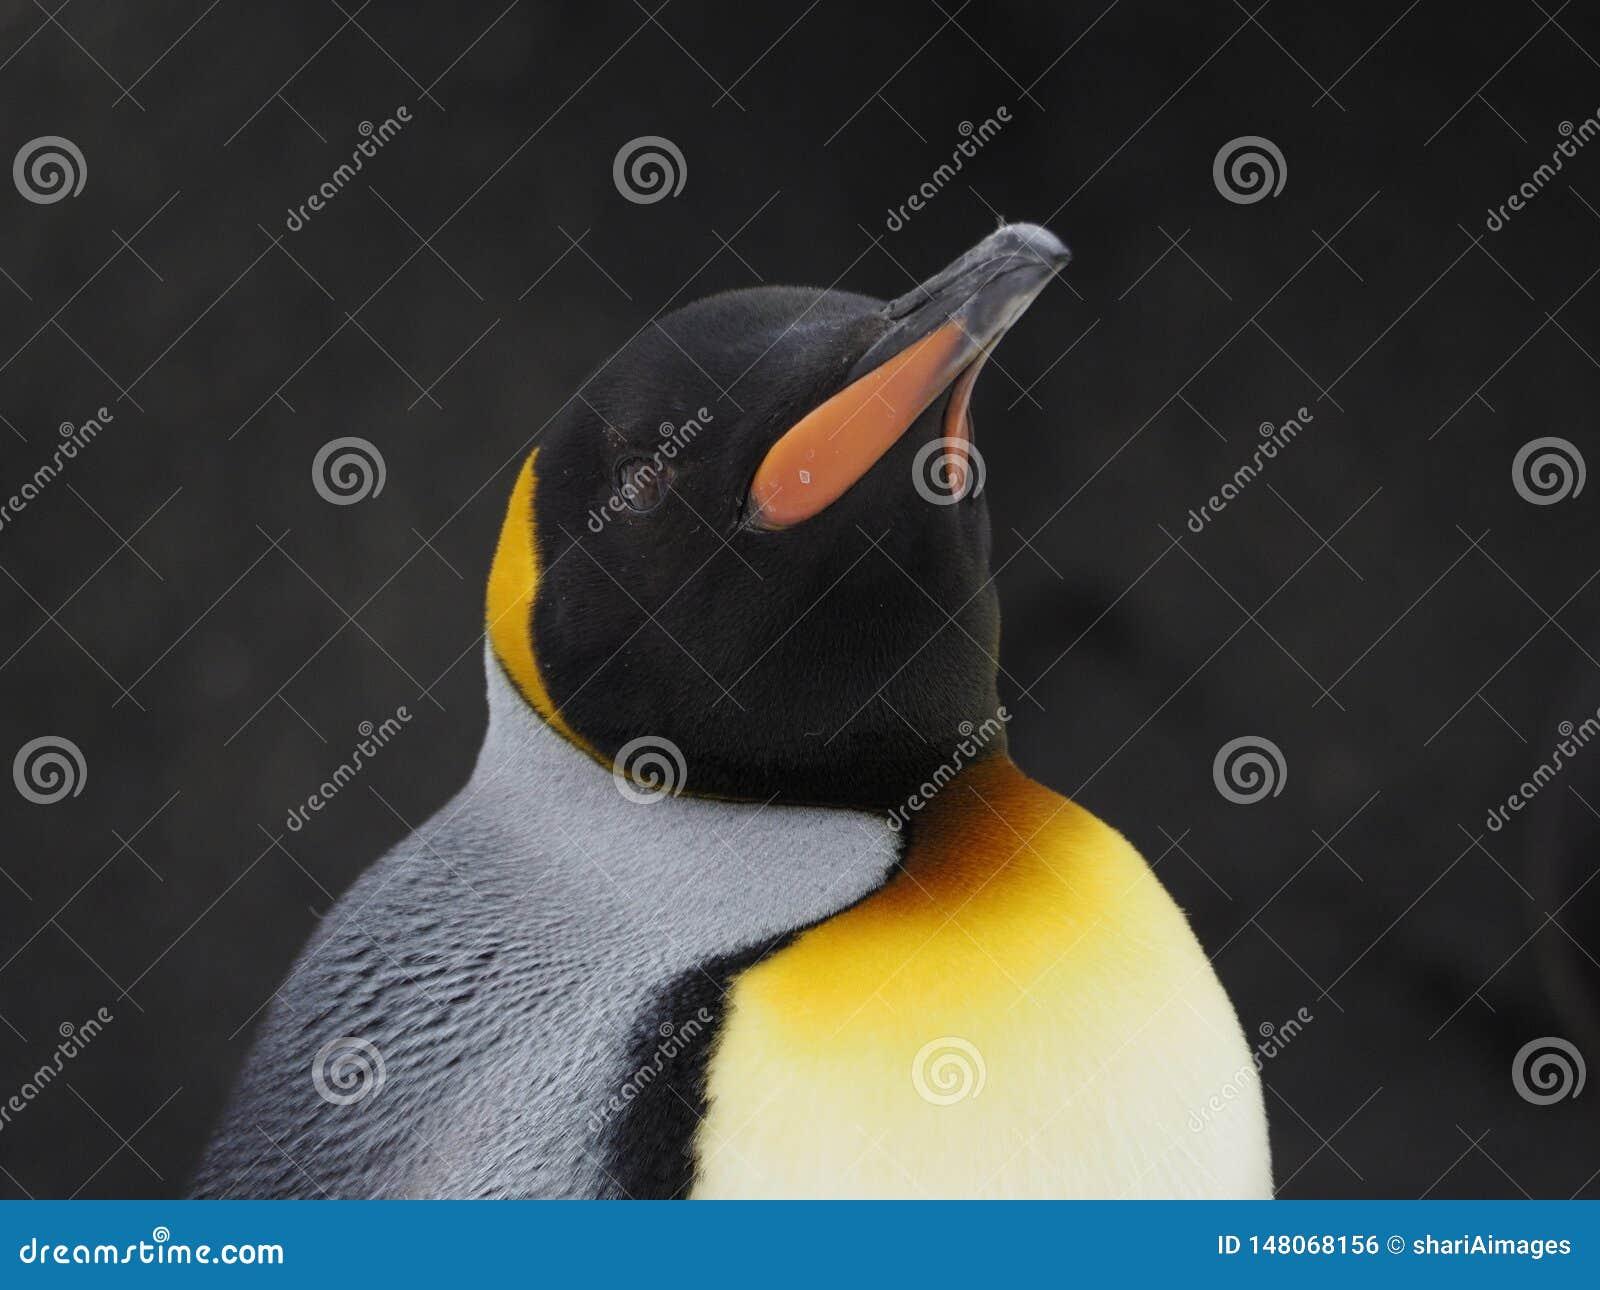 Голова сняла одиночного пингвина императора